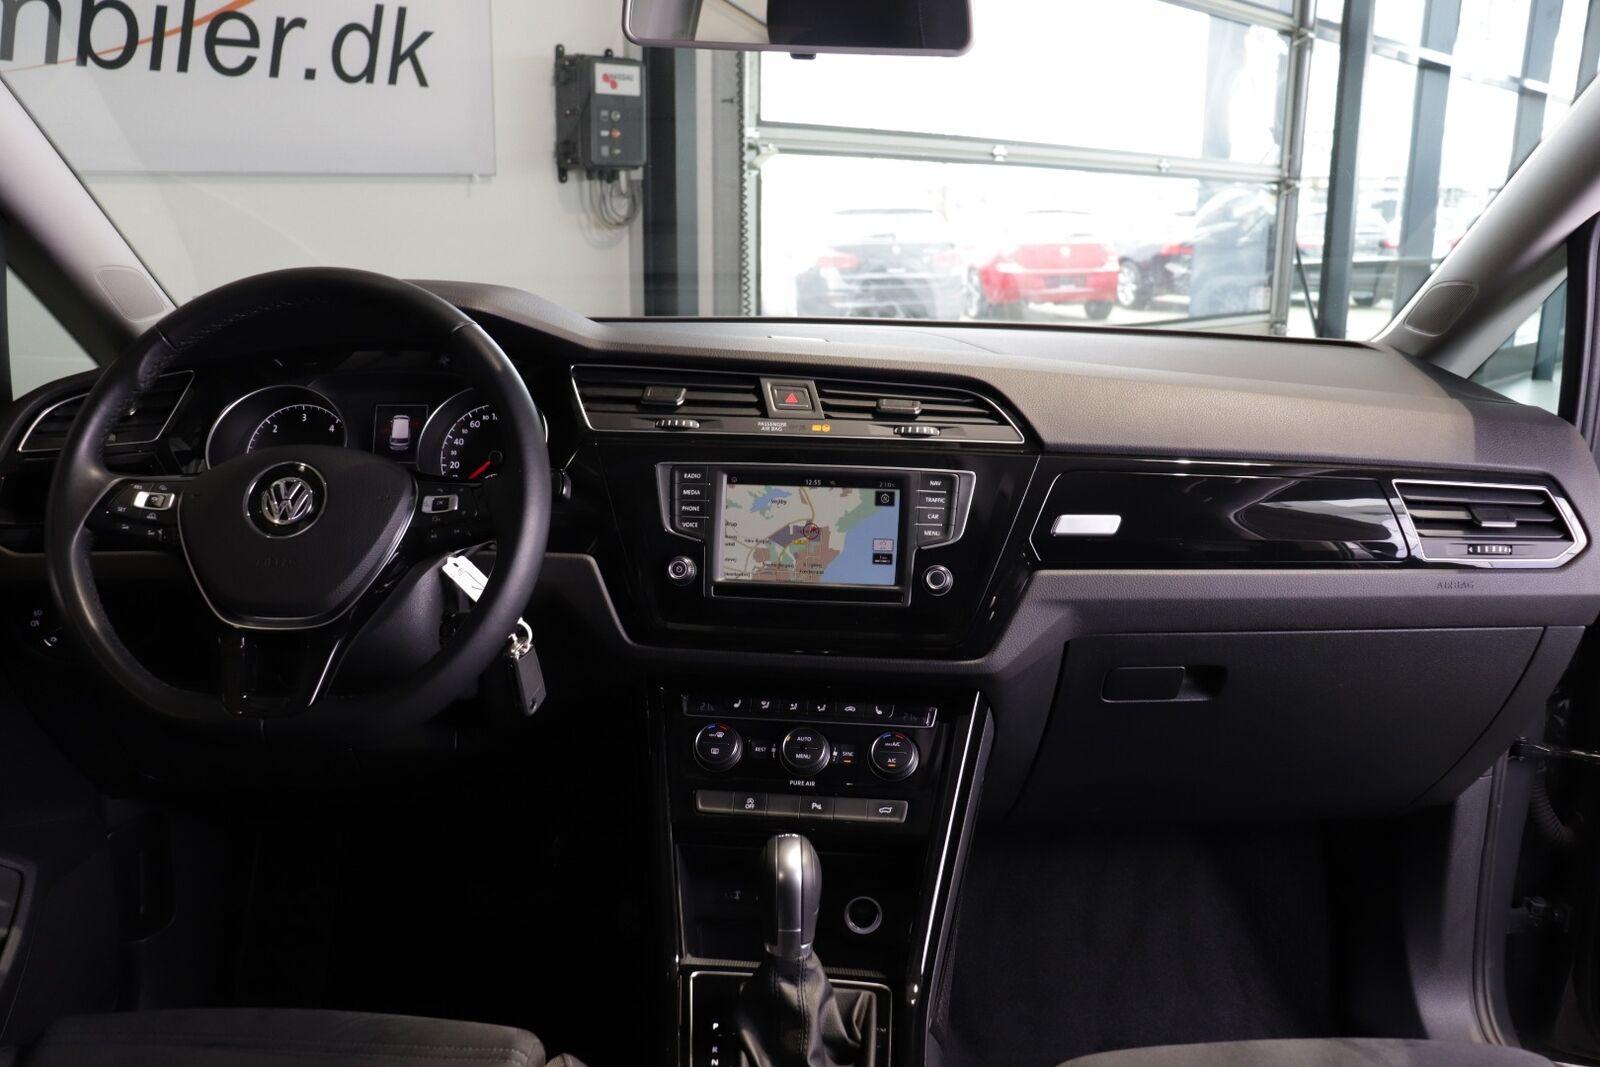 VW Touran TDi 150 Highline DSG